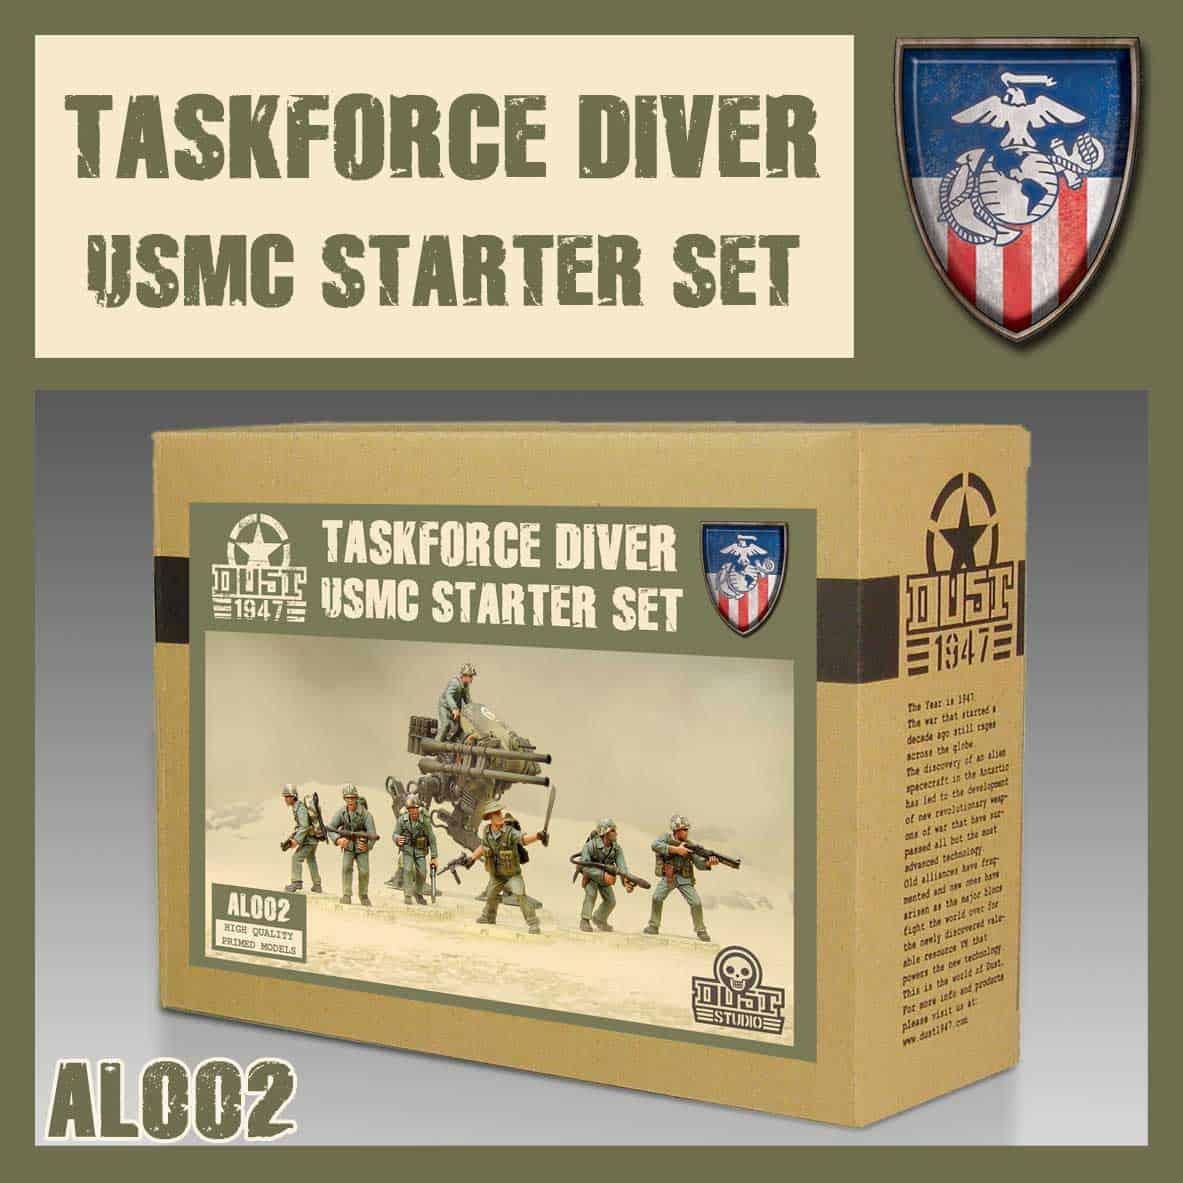 Taskforce Diver